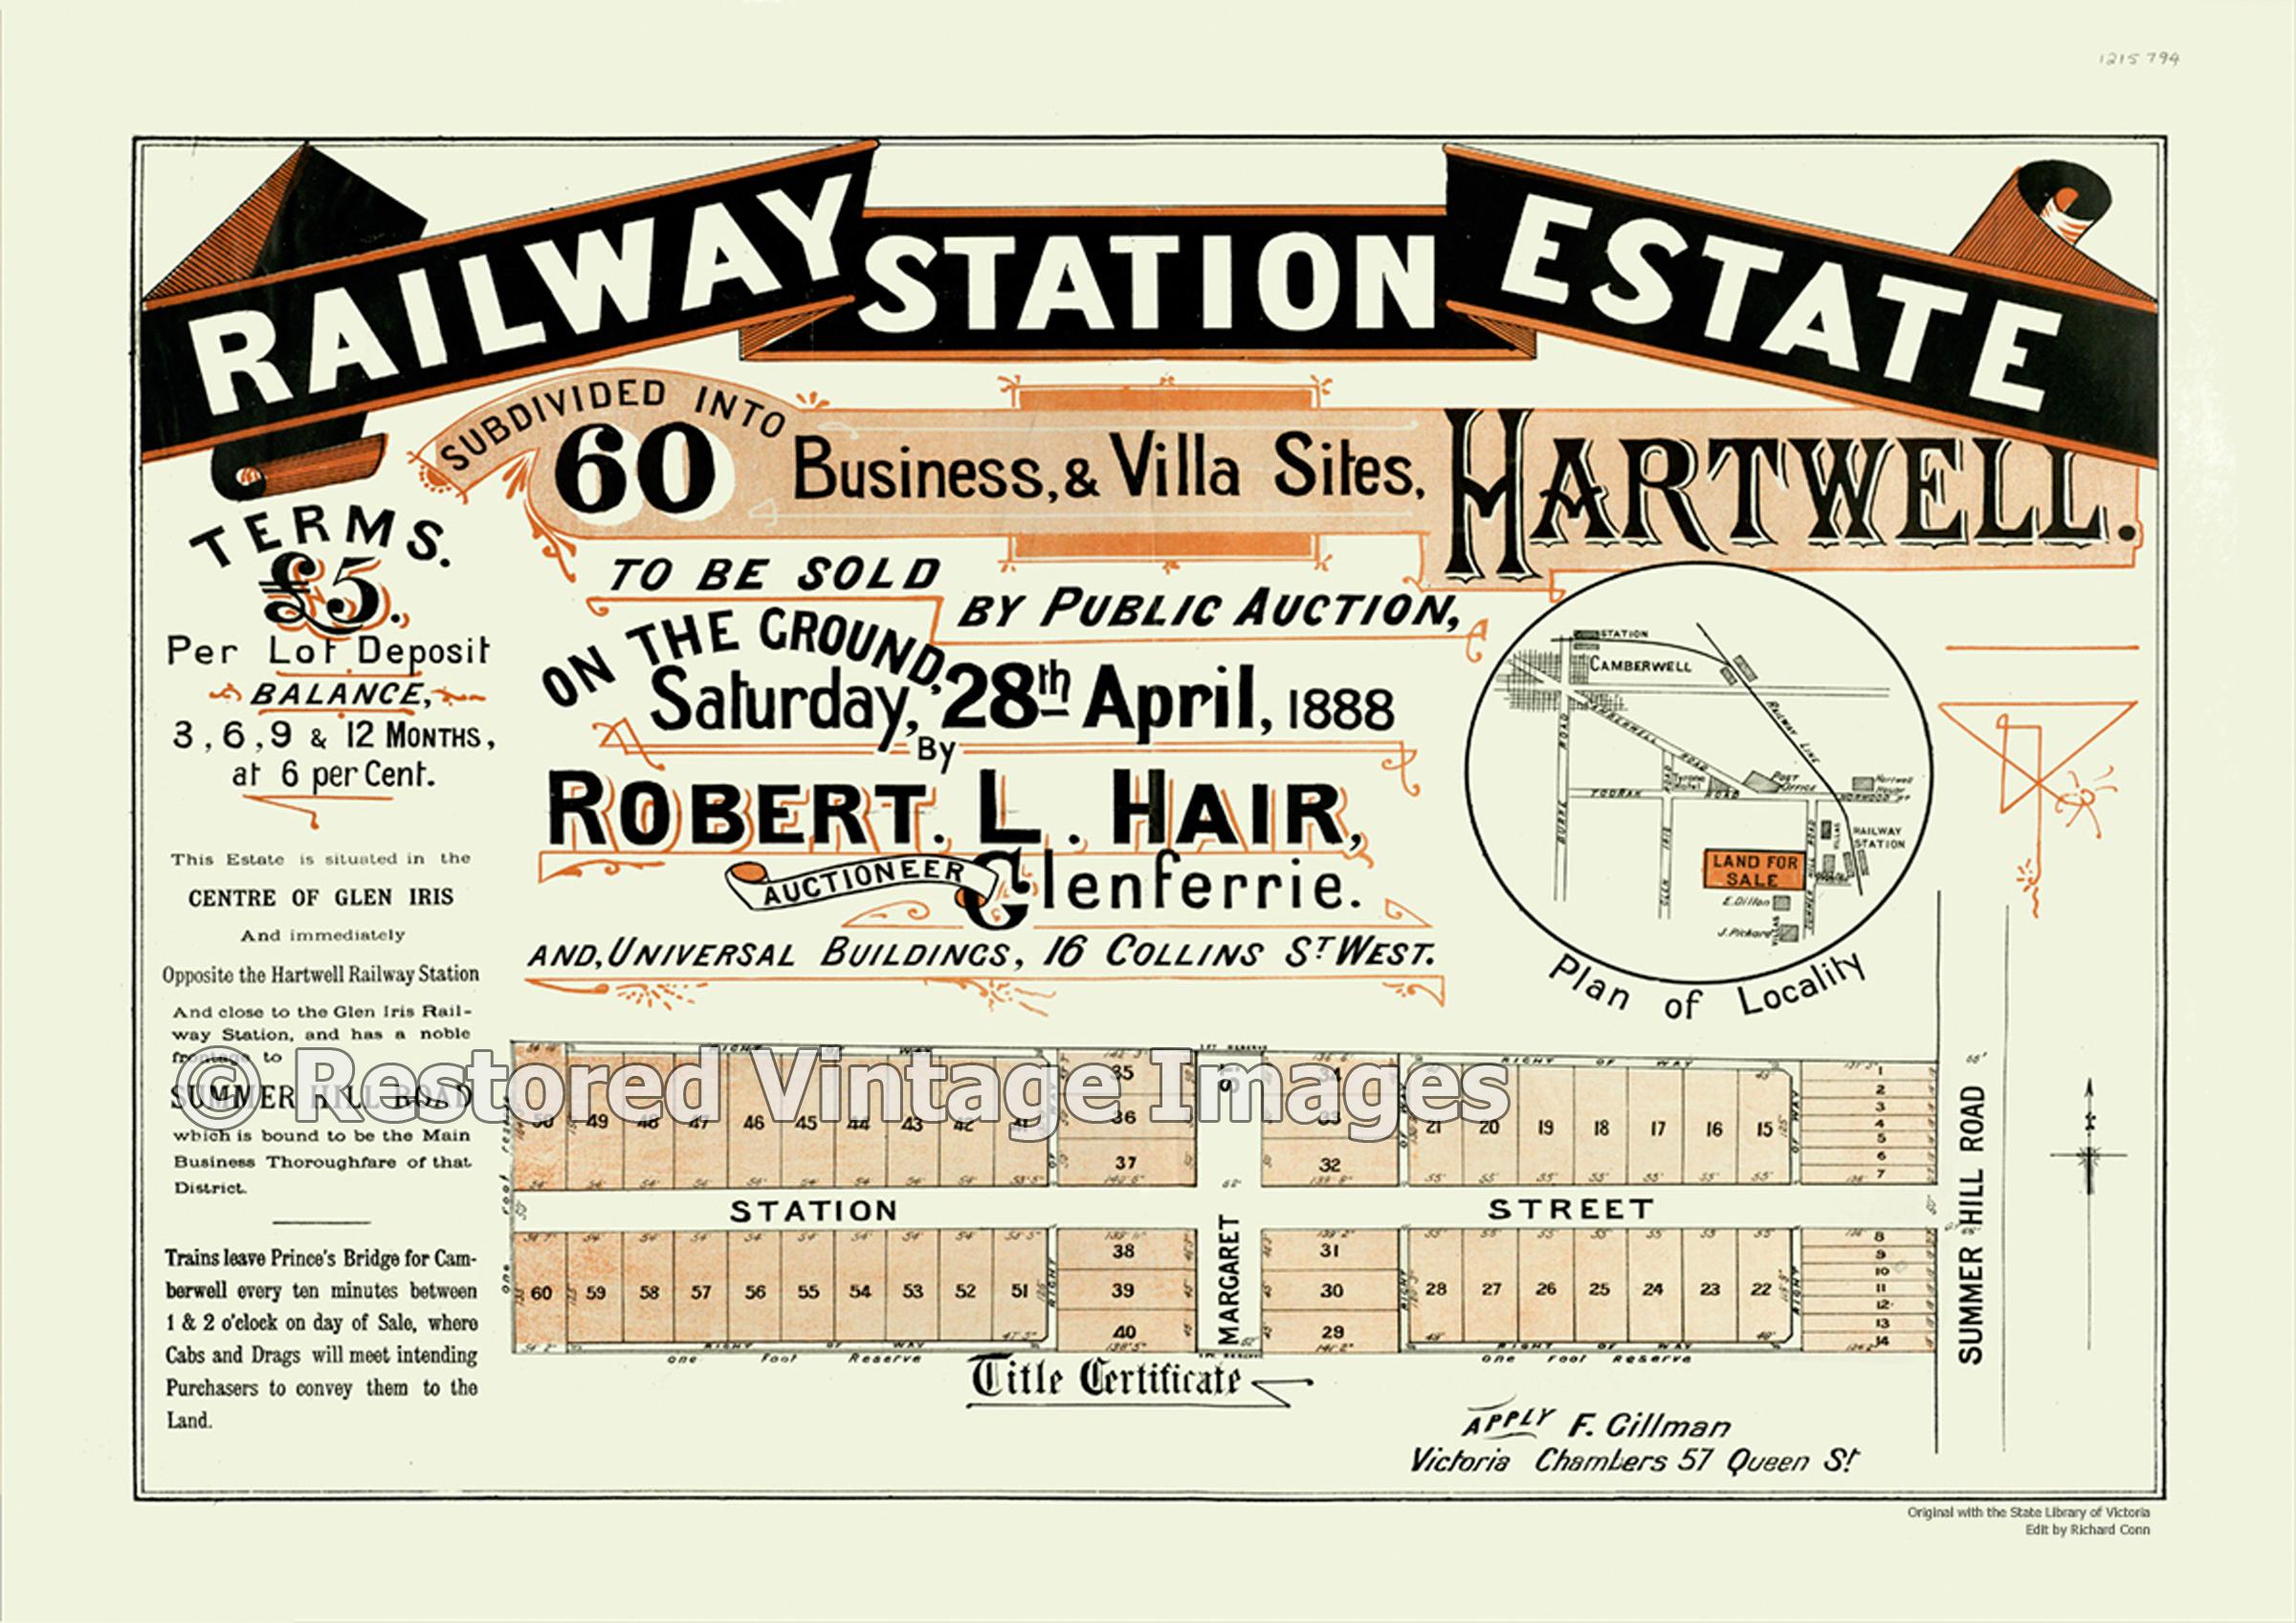 Railway Station Estate Hartwell 1888 – Glen Iris